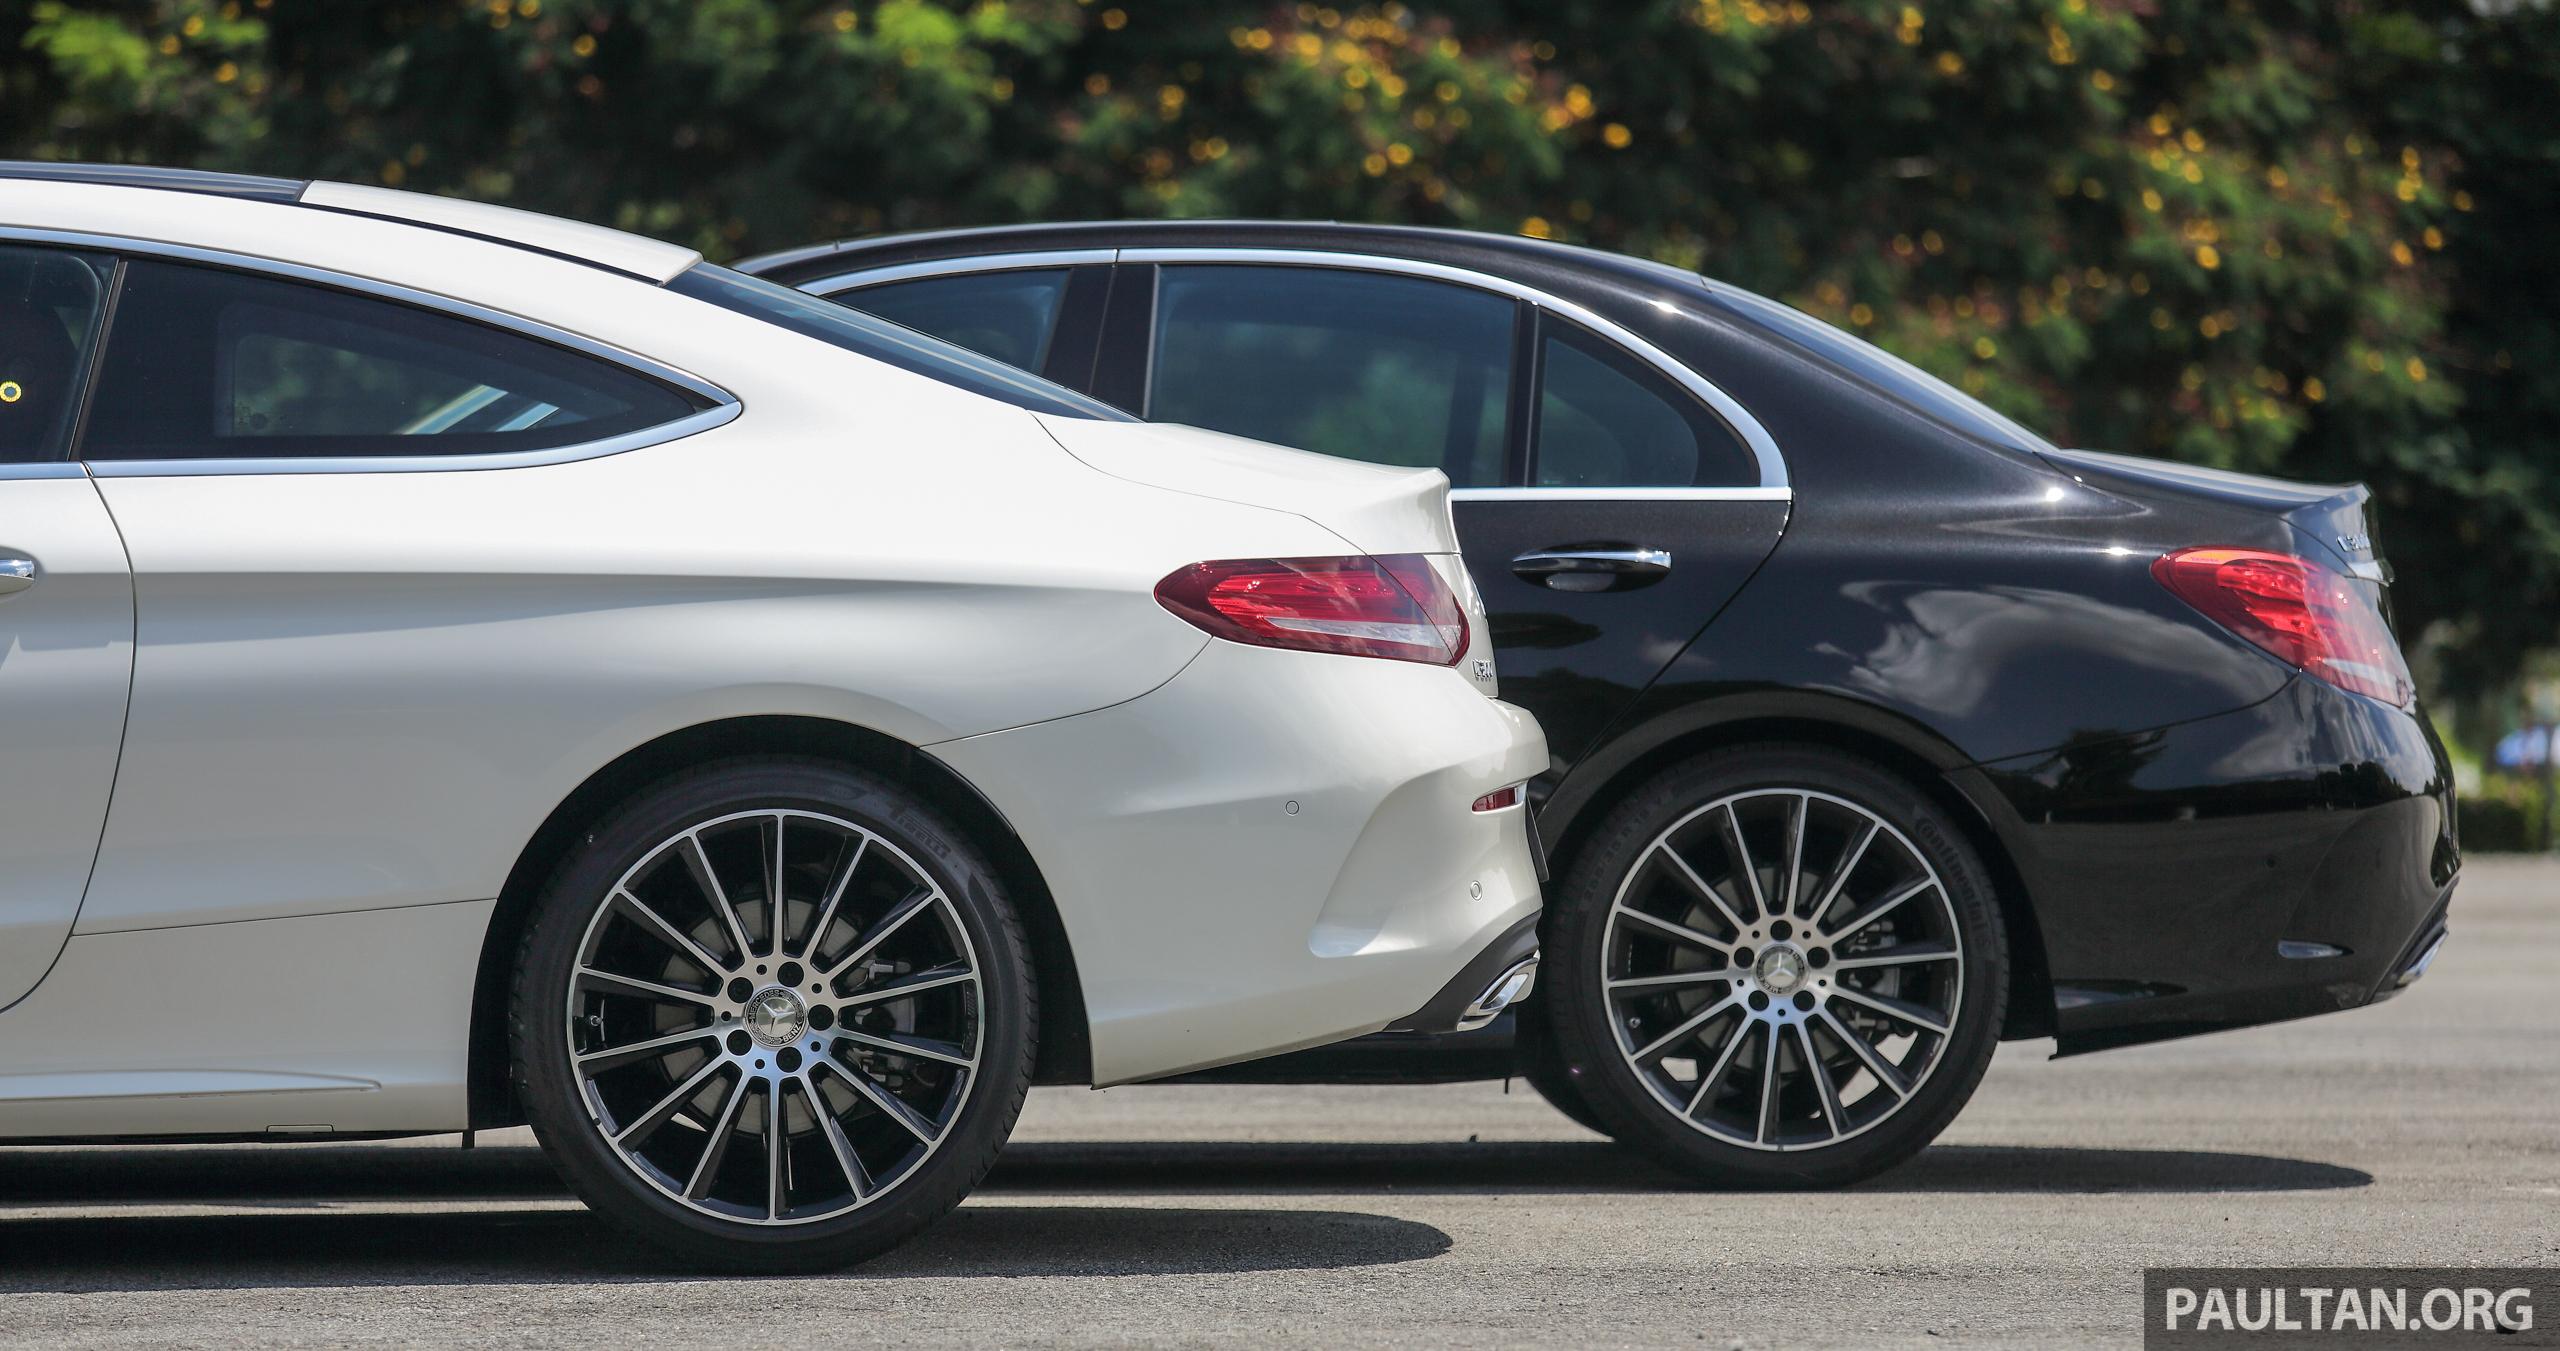 Coupe Vs Sedan >> GALLERY: Mercedes-Benz C300 Coupe vs sedan Image 495926